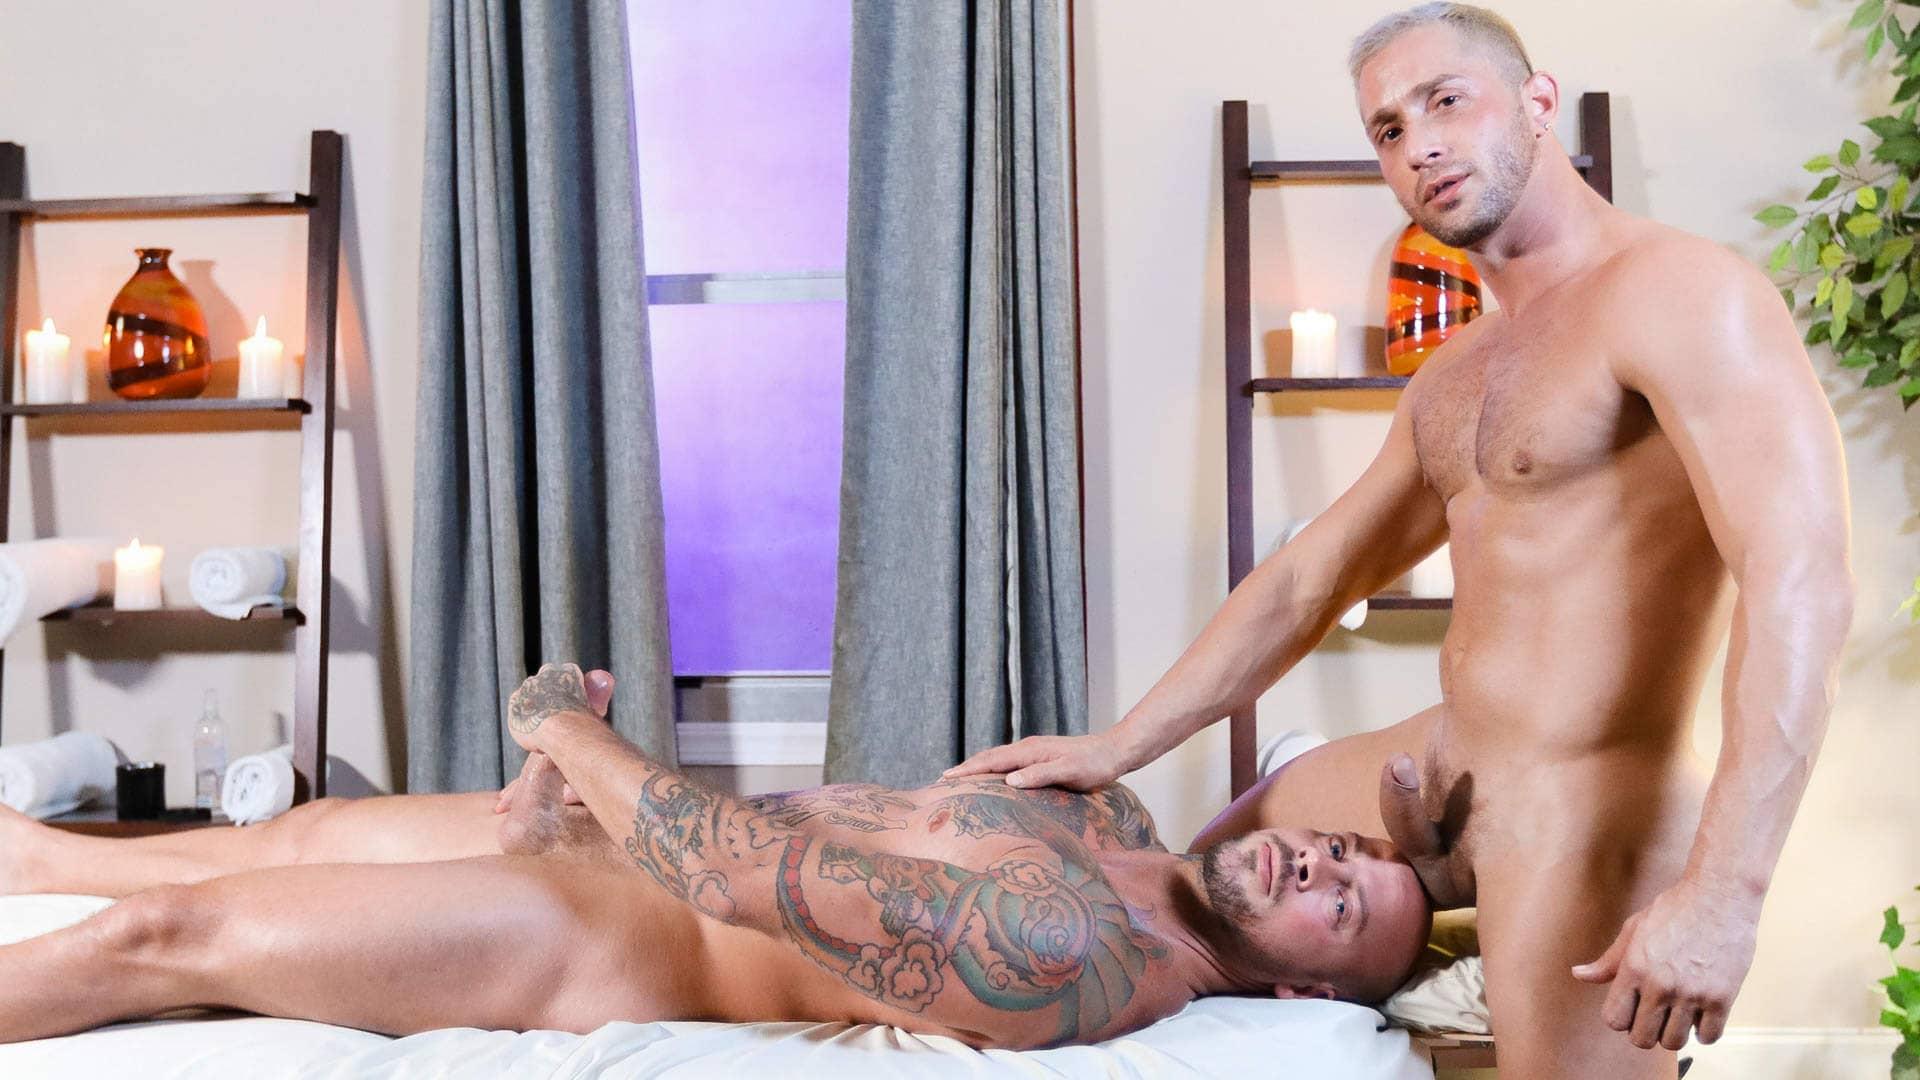 Deep and Hard Massage – Sean Duran and Armando De Armas